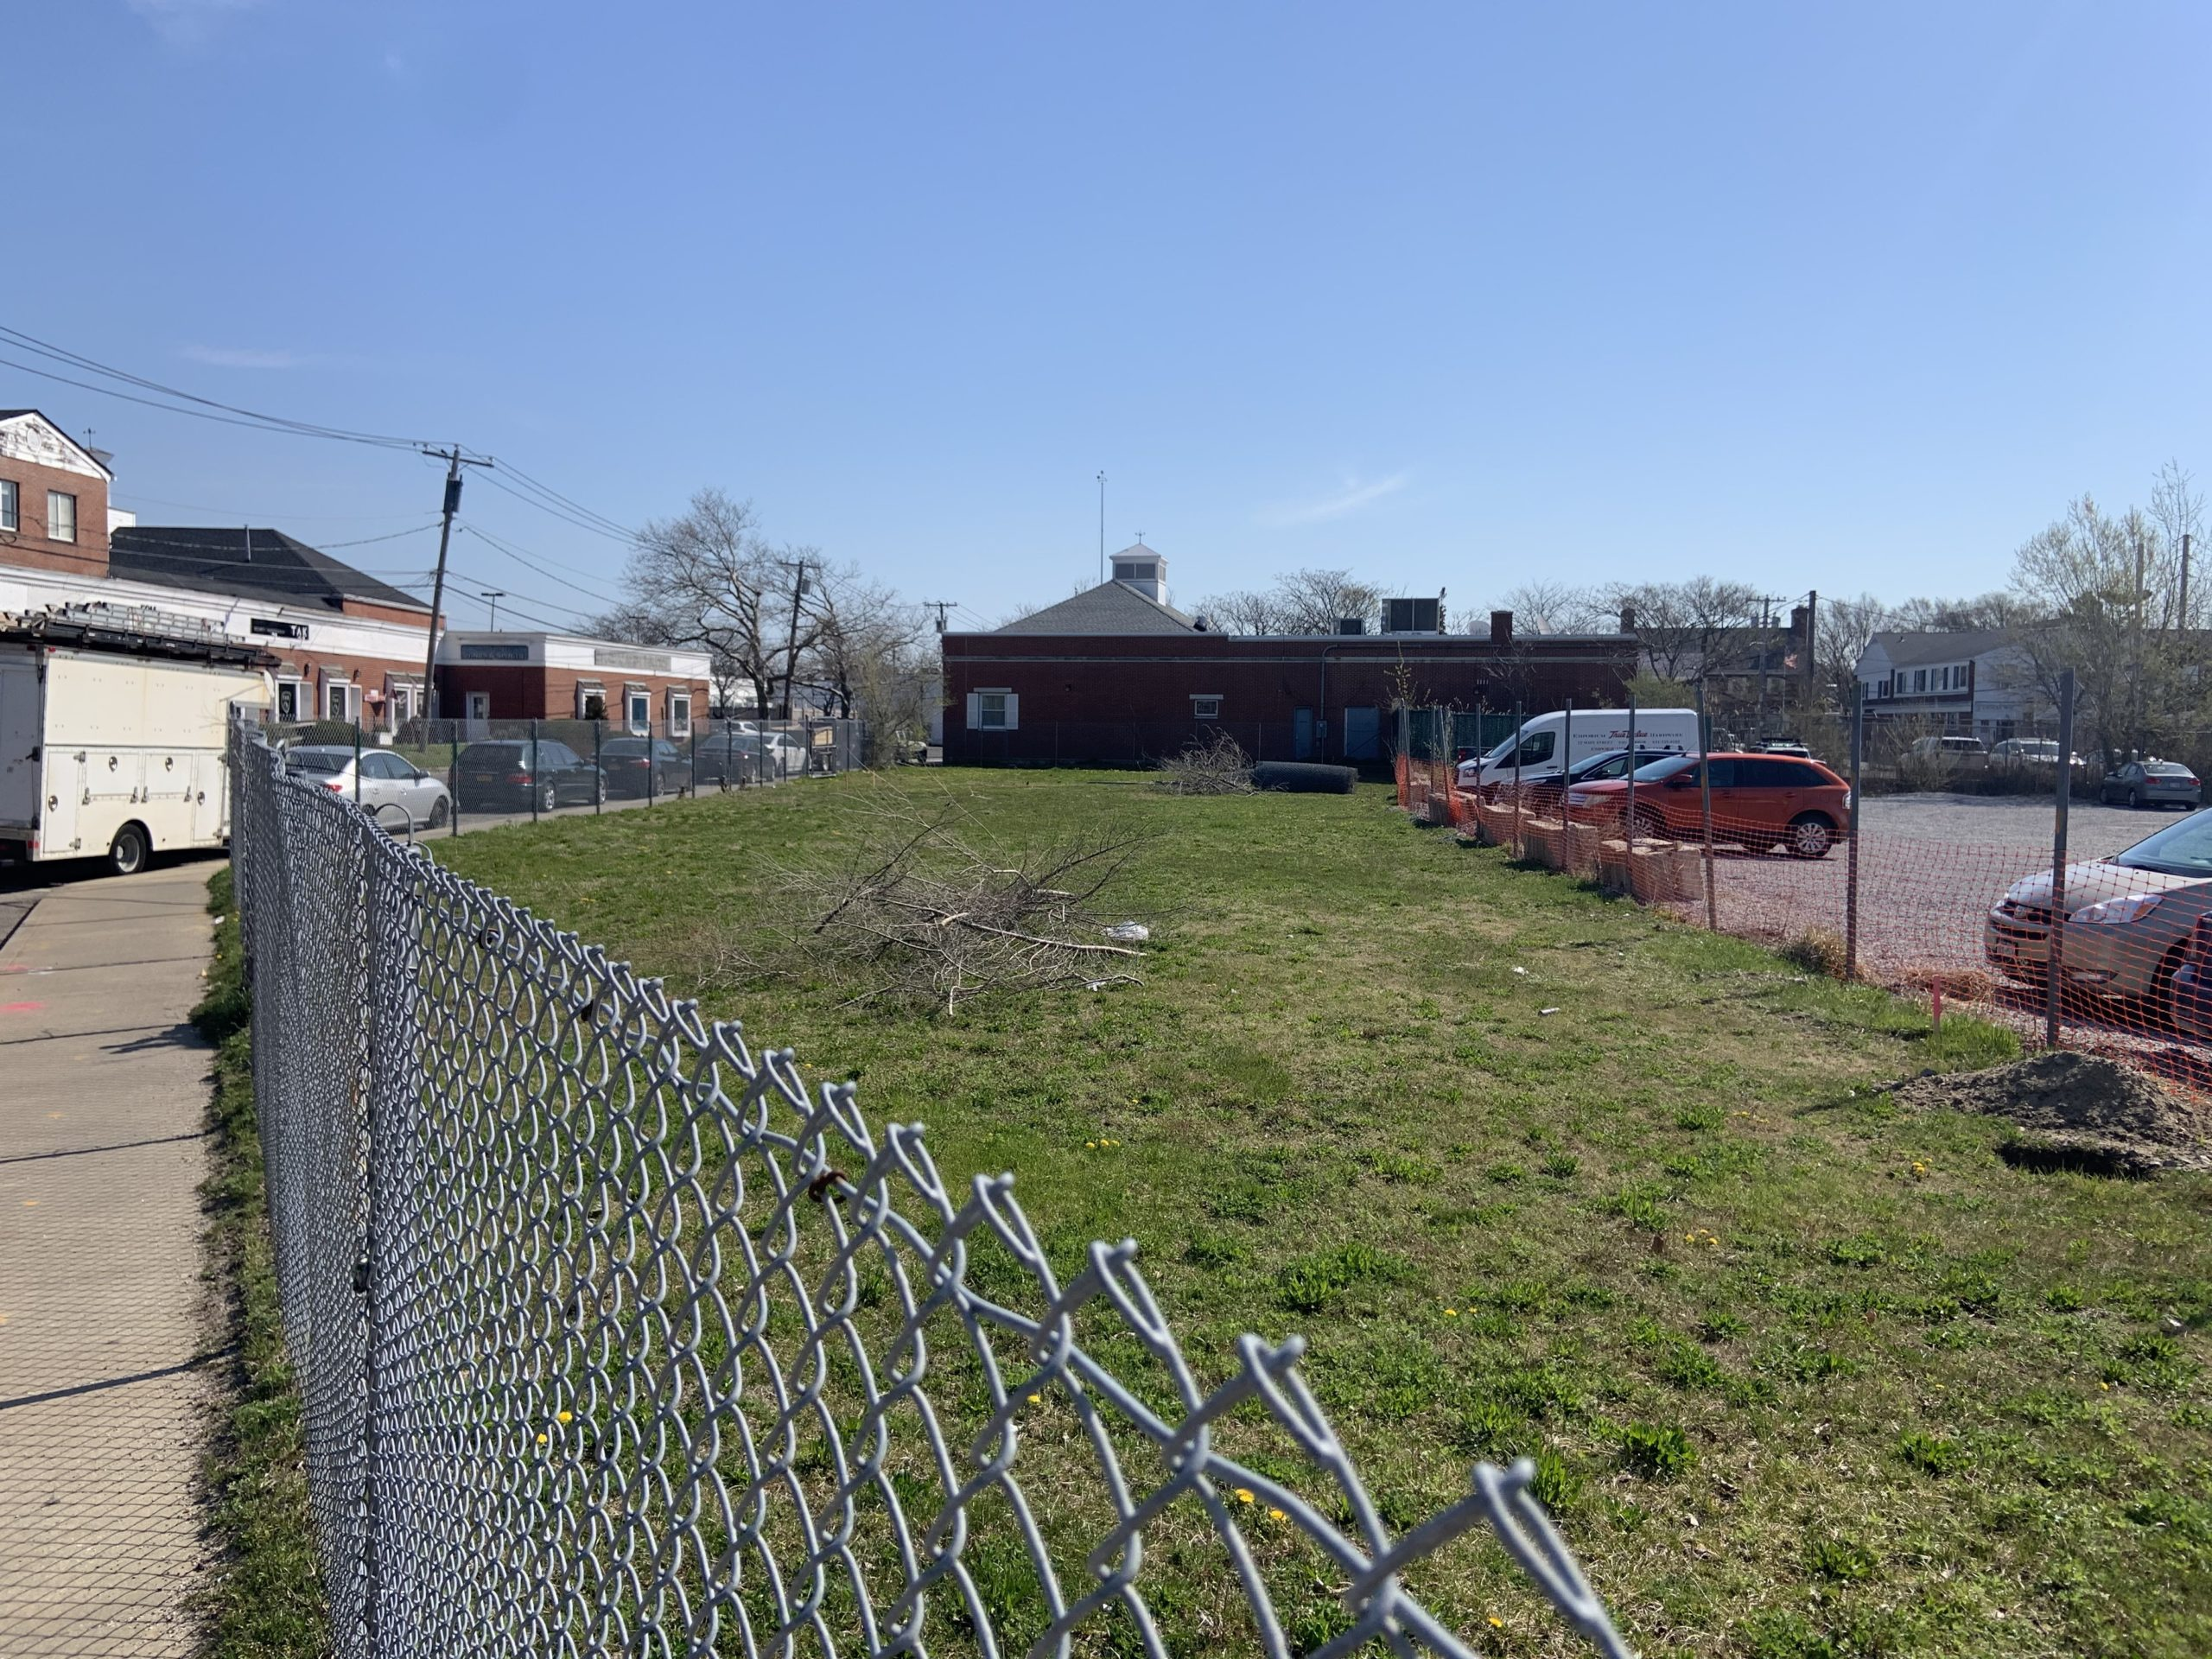 The Schiavoni property on Long Island Avenue remains vacant. STEPHEN J. KOTZ